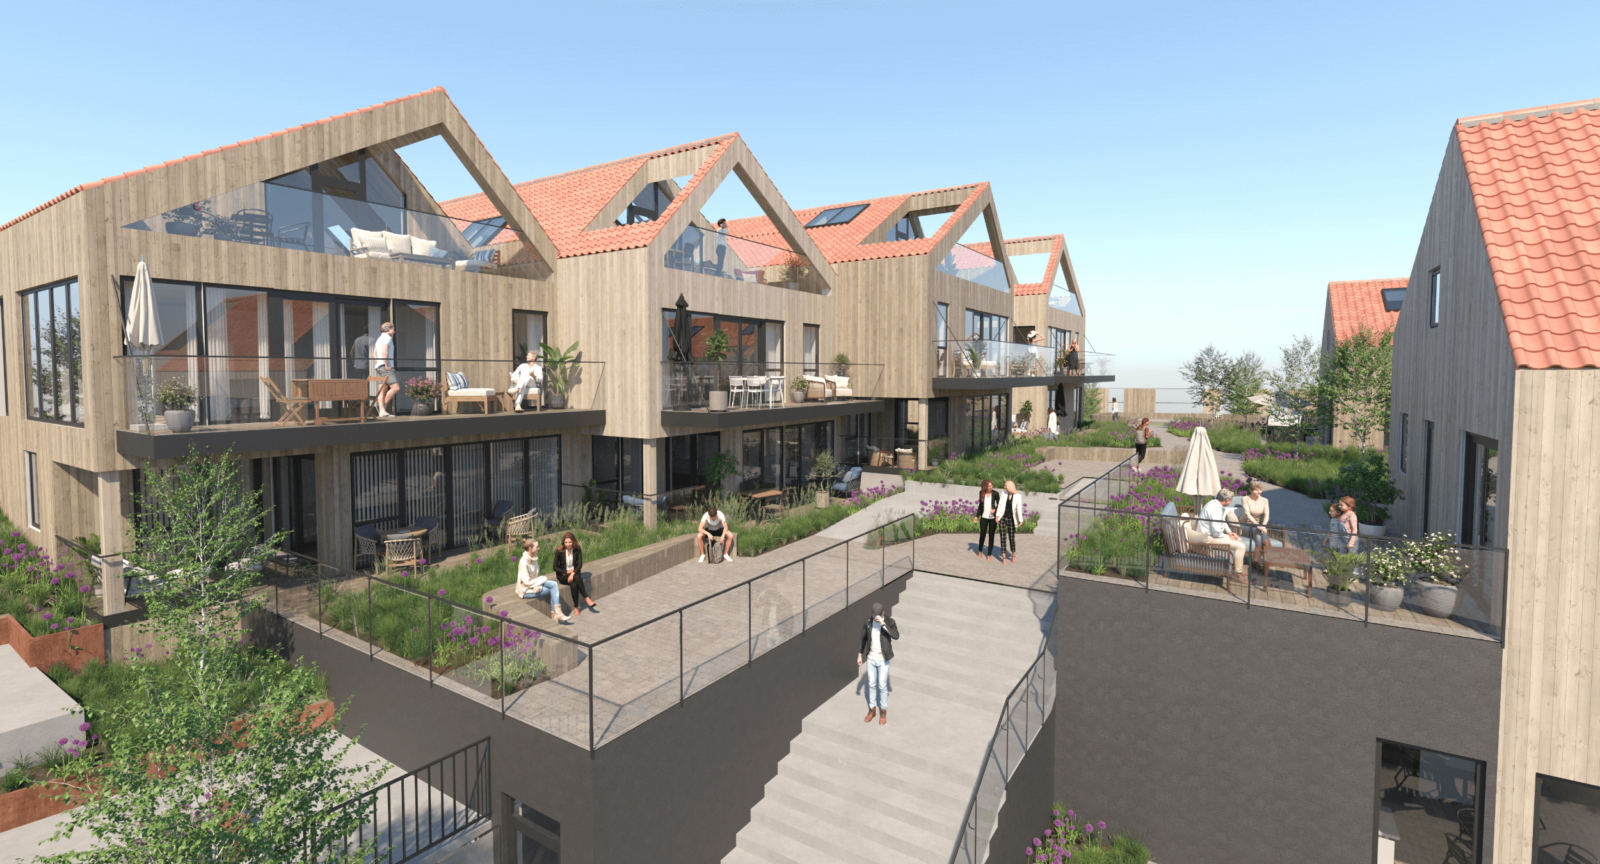 Nytt boligprosjekt i Vollen Marina - mellom radene